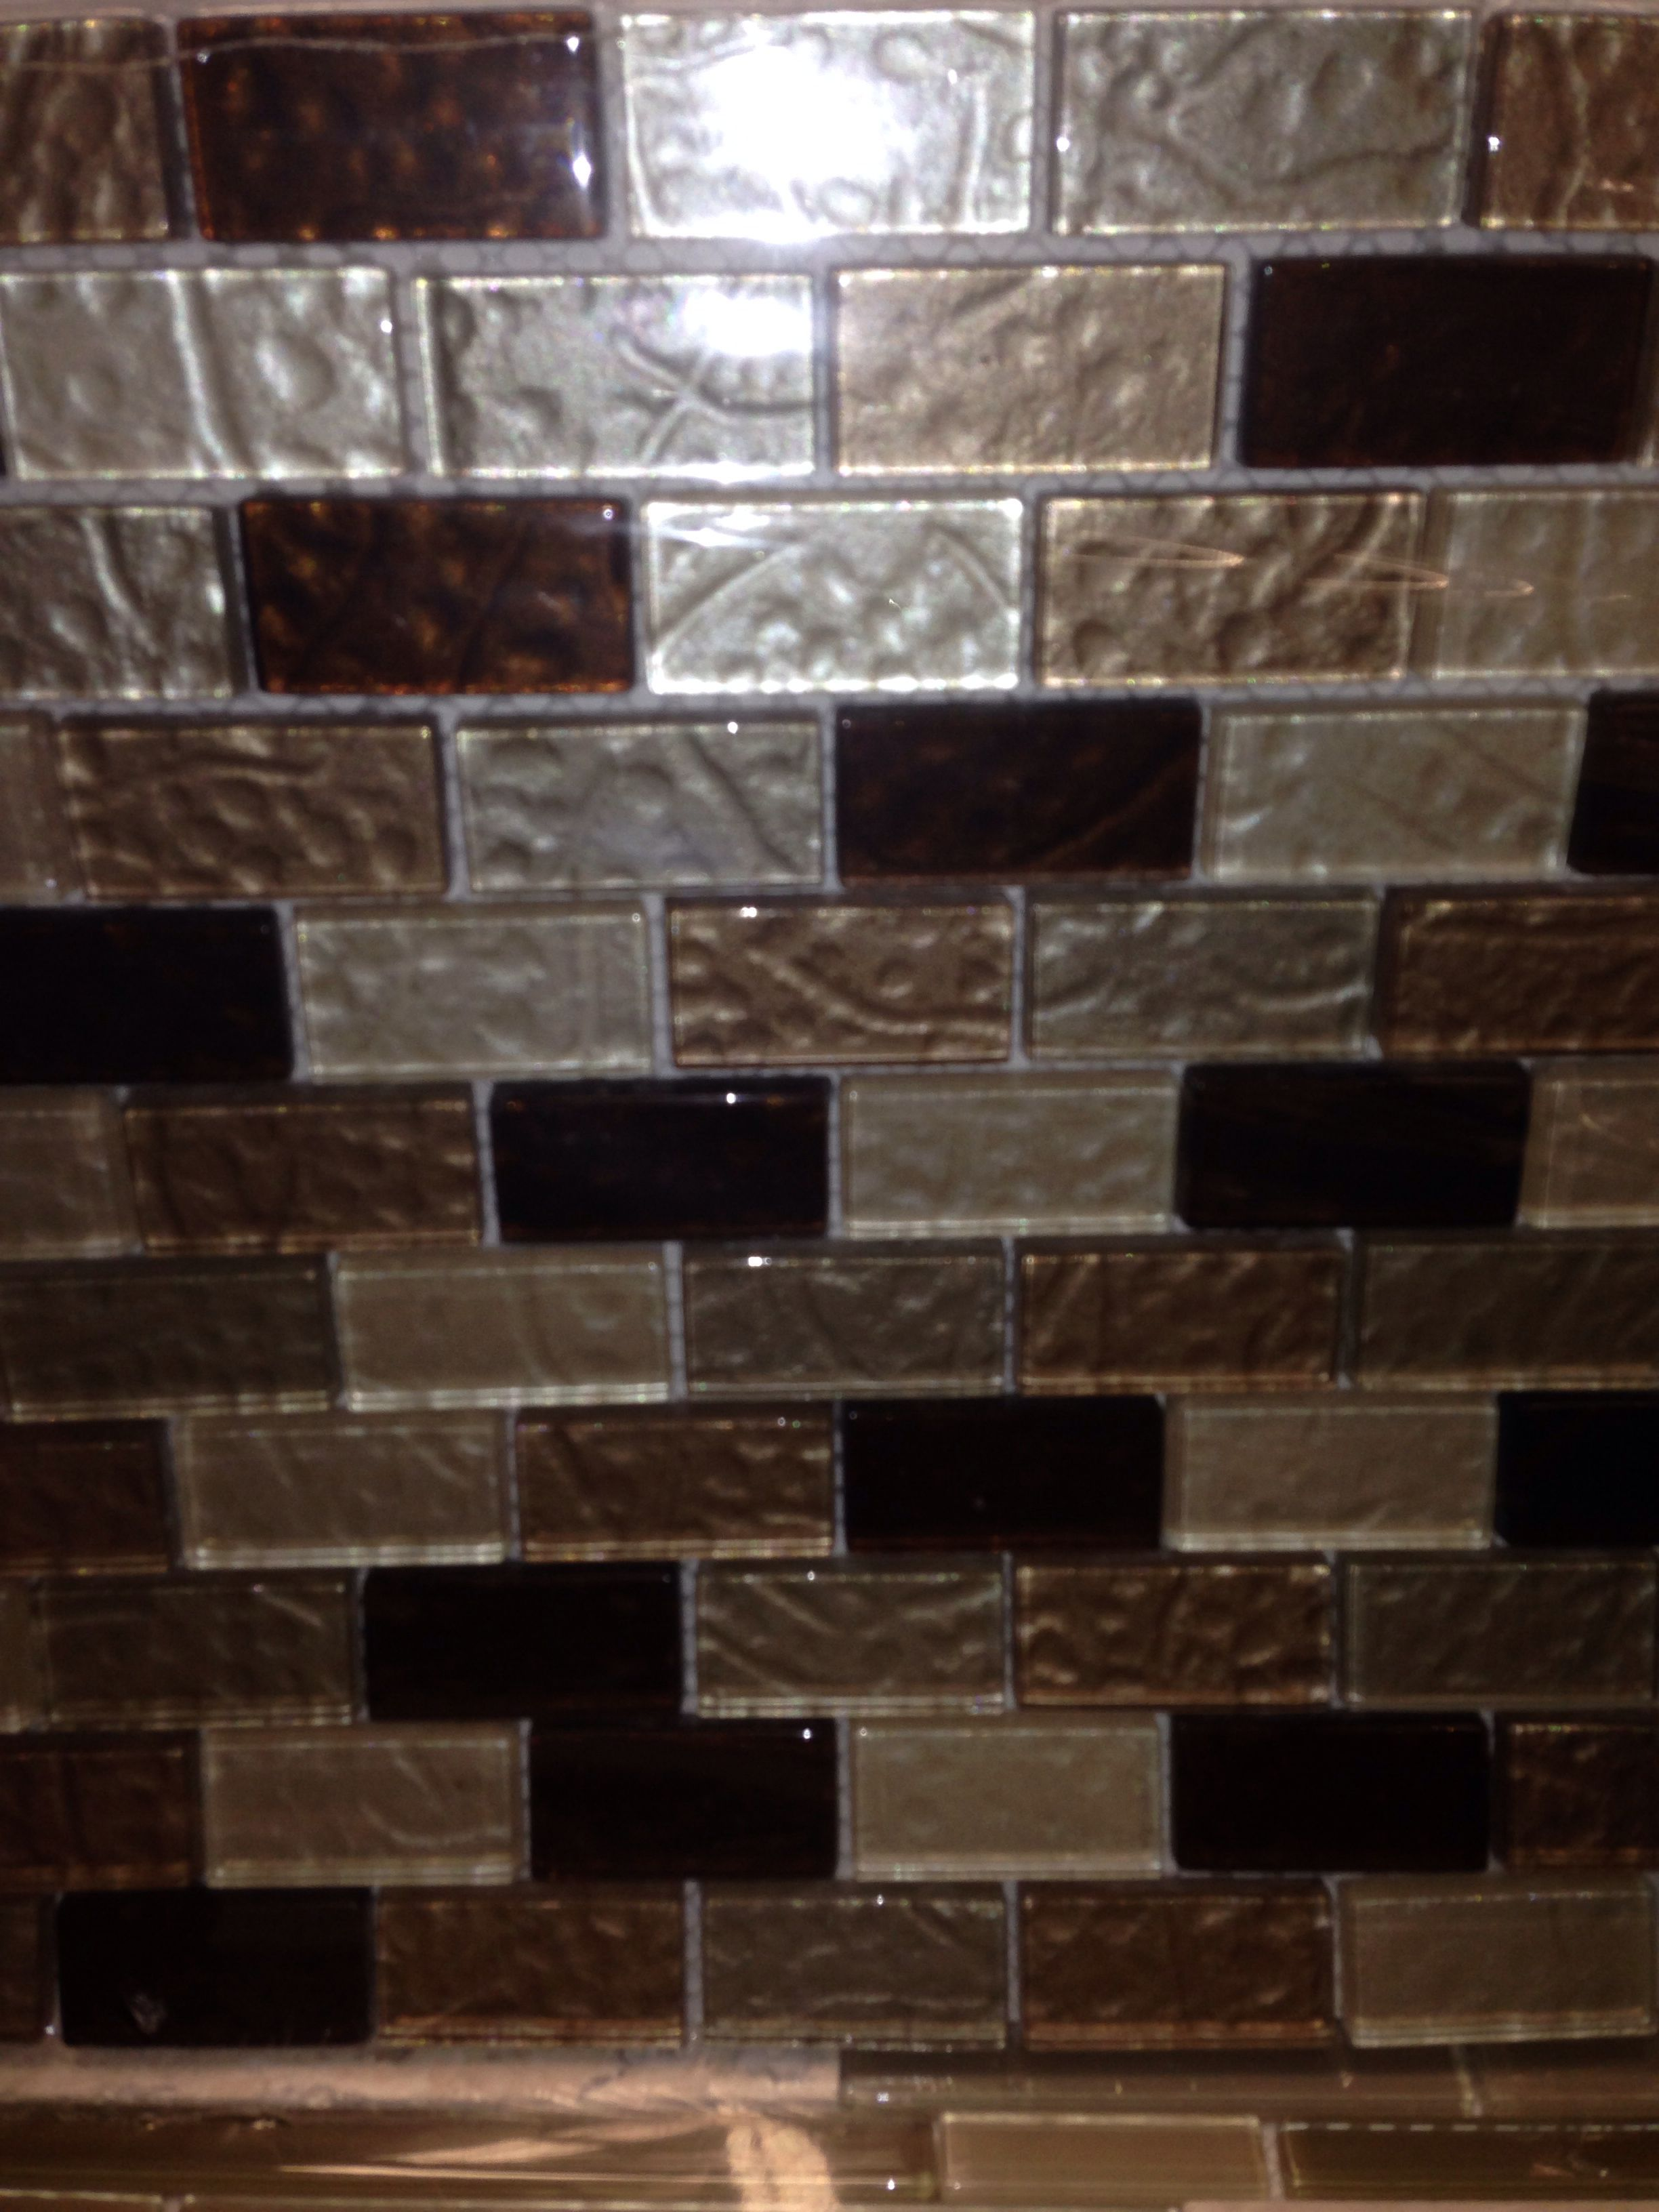 home depot glass tile kitchen backsplash motion sensor faucet 19 cute galleries djenne